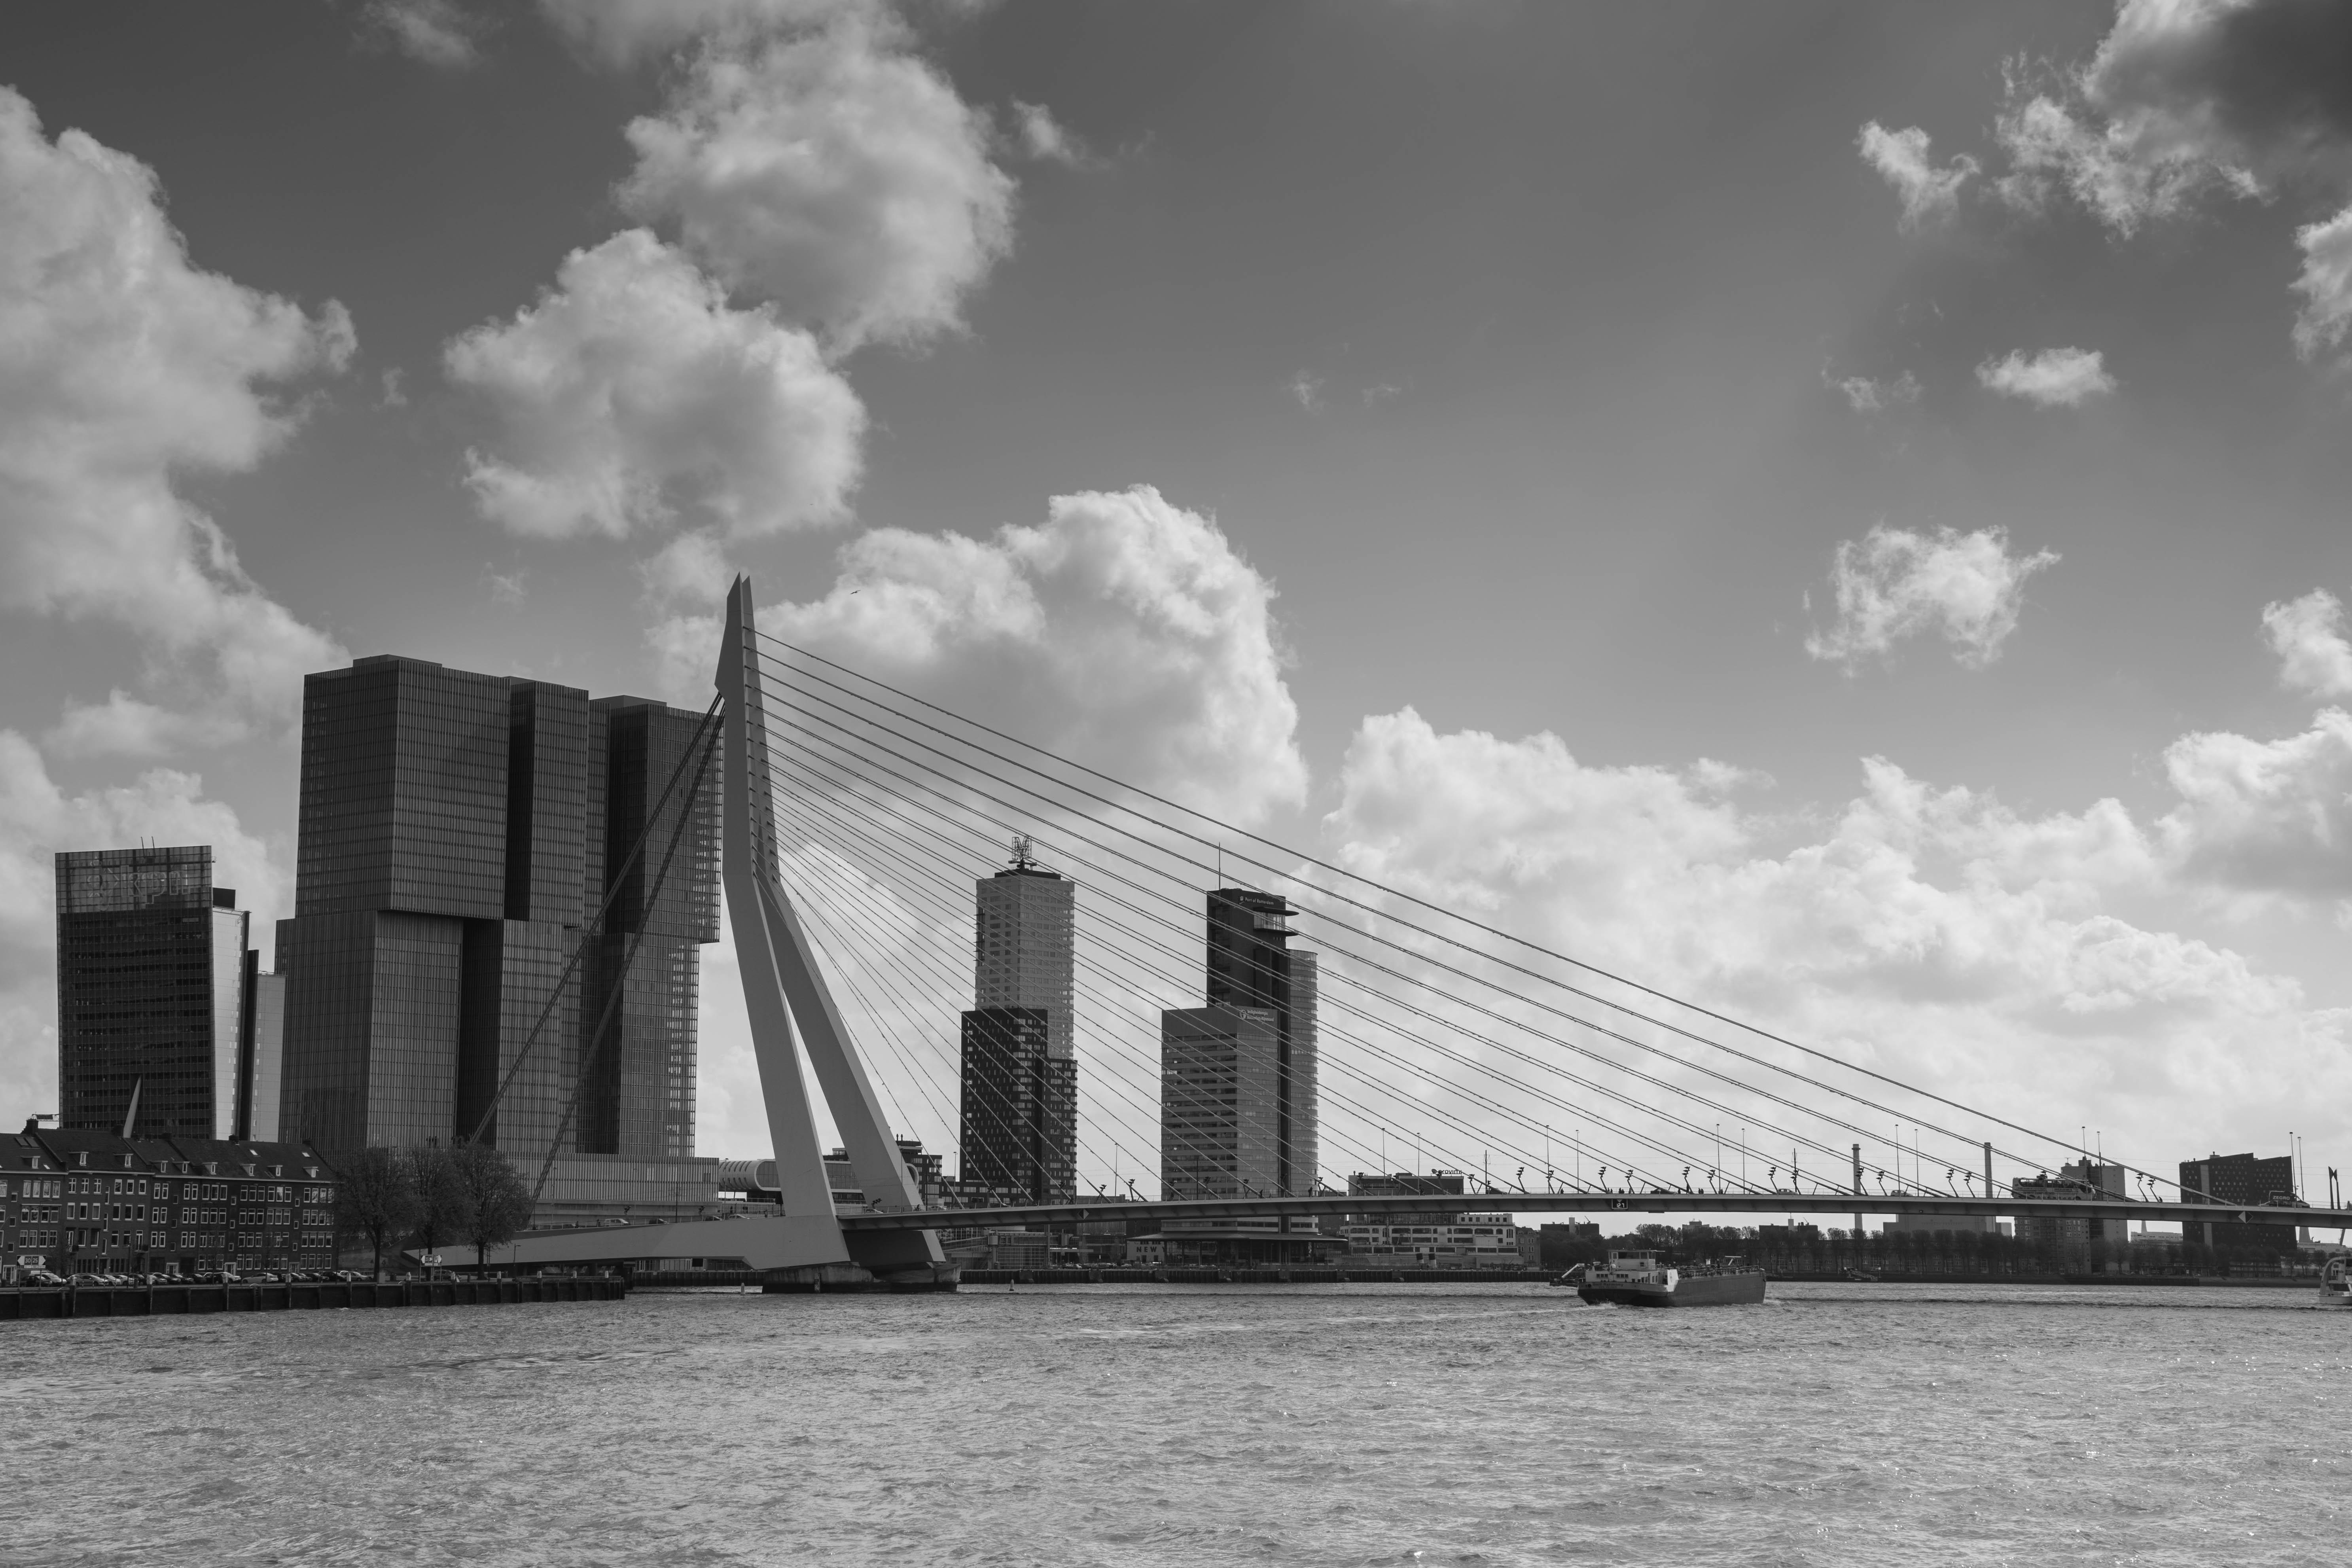 08_Erasmus bridge Rotterdam